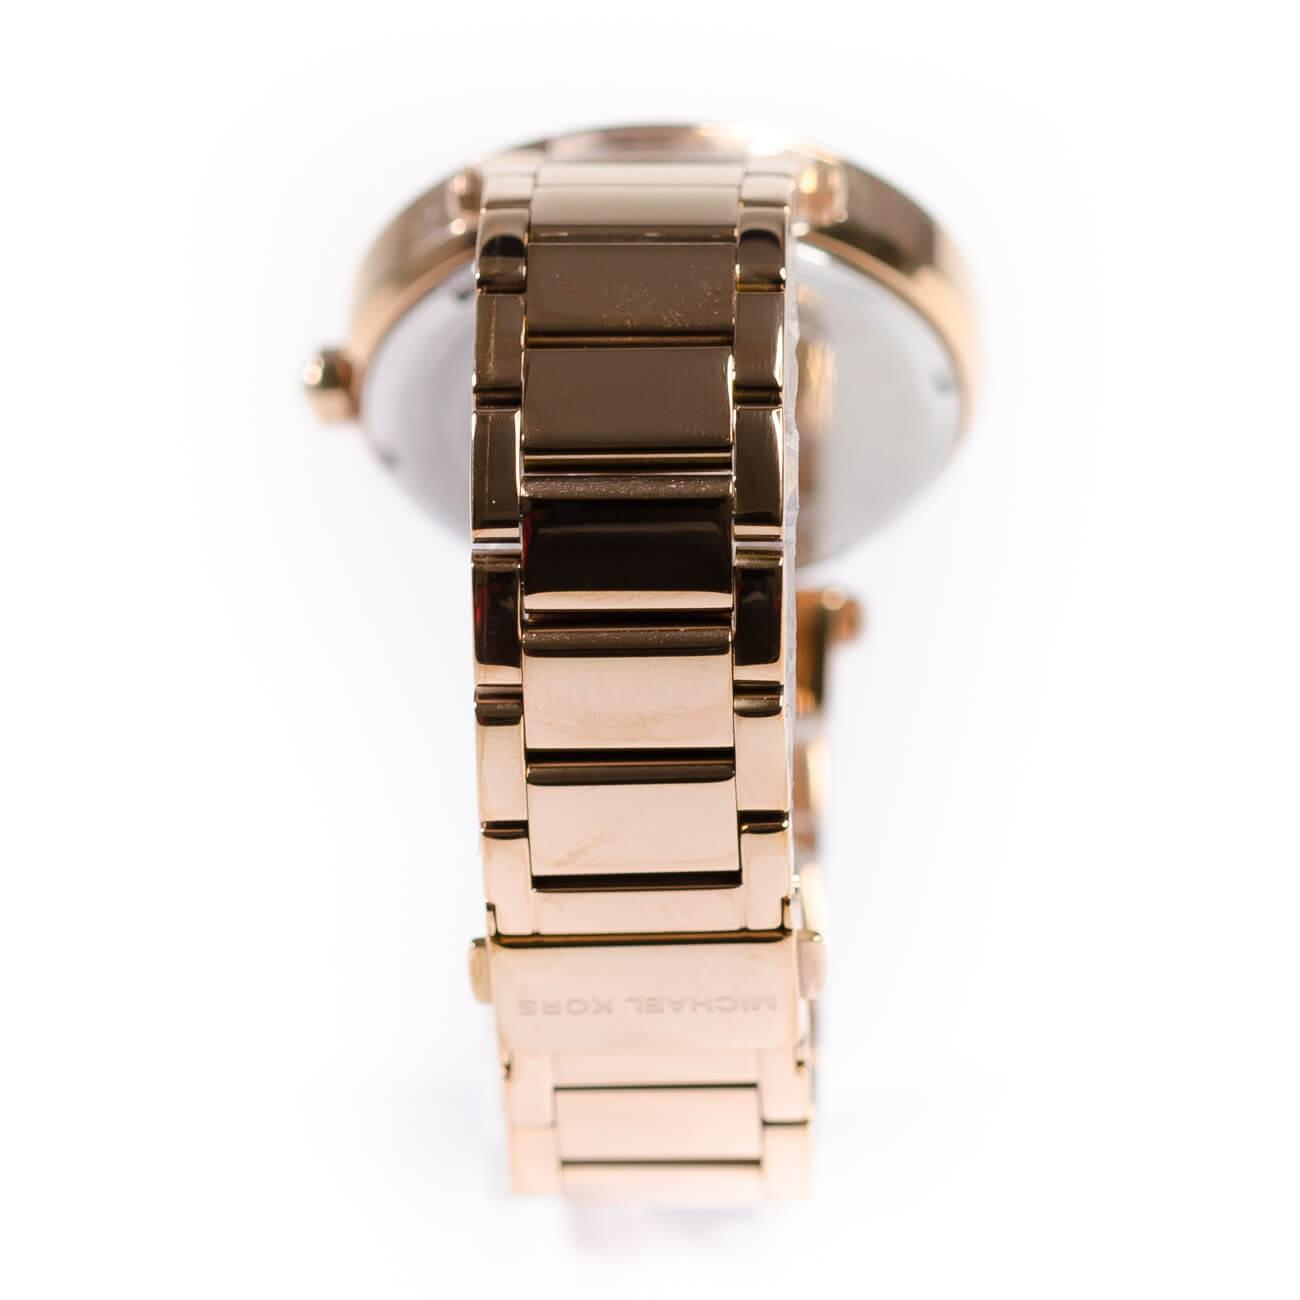 da59edfe8c43 ... Michael Kors Parker Chronograph Gold-Tone Ladies Watch. Zoom · lightbox  moreview · lightbox moreview · lightbox moreview · lightbox moreview ·  lightbox ...